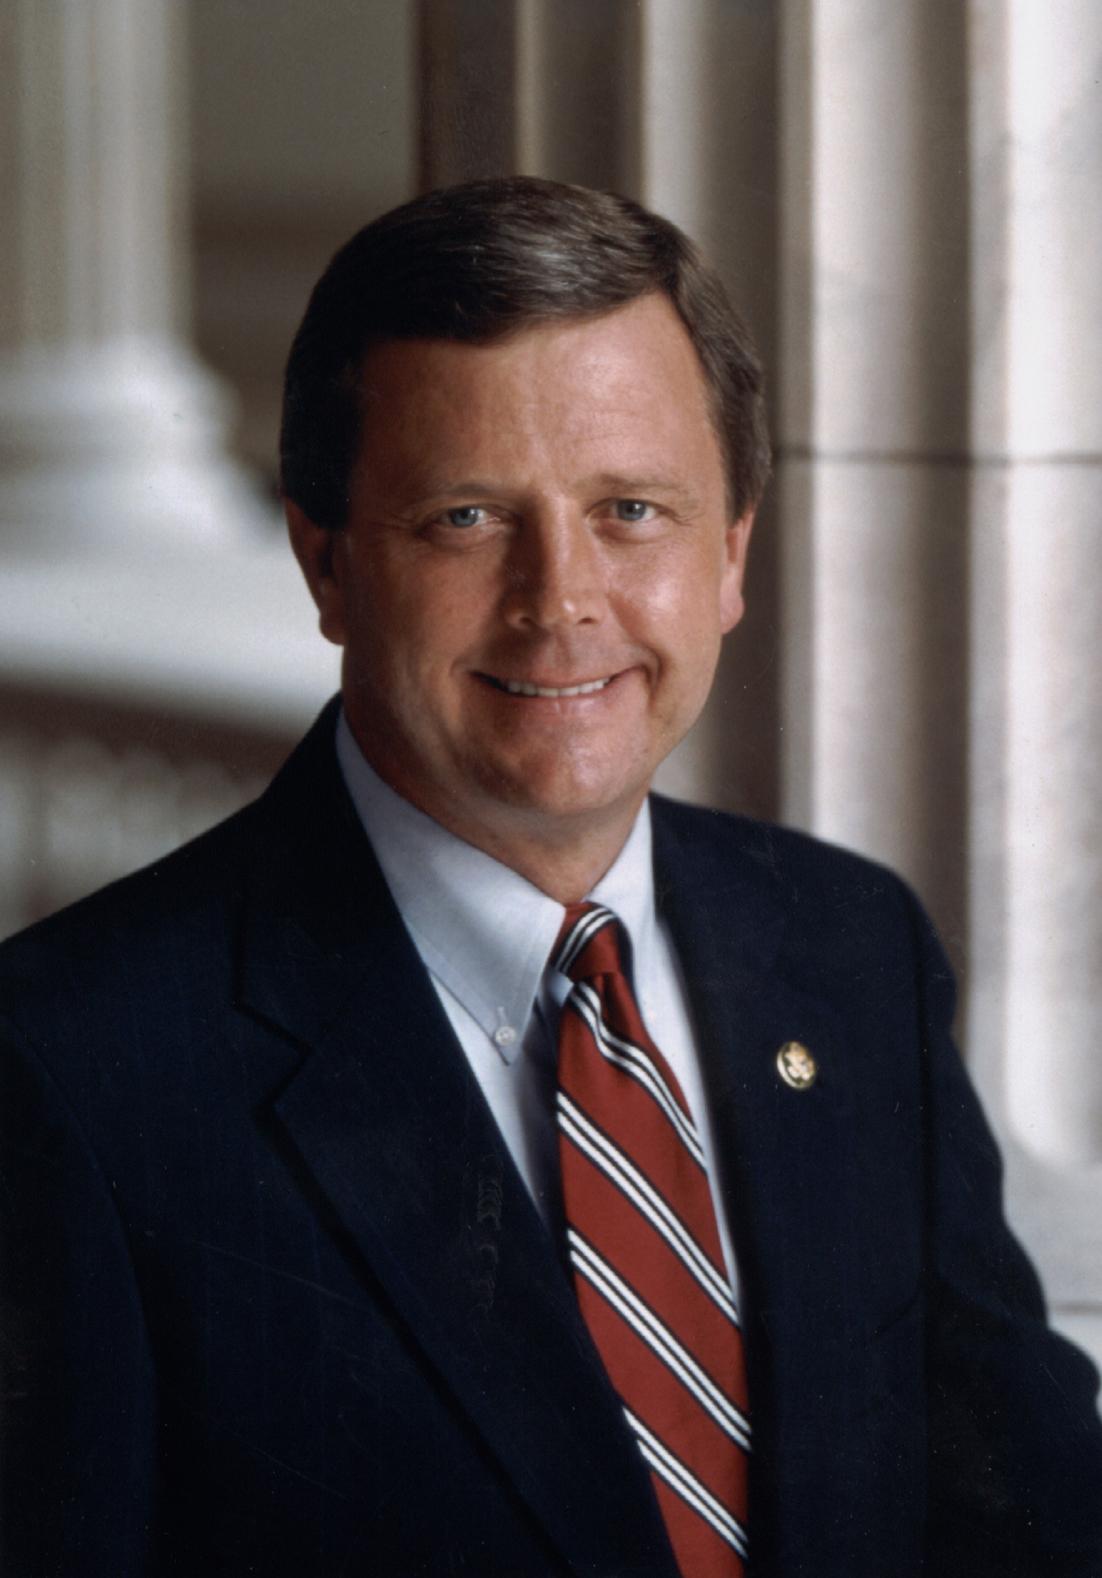 Congressman Latham